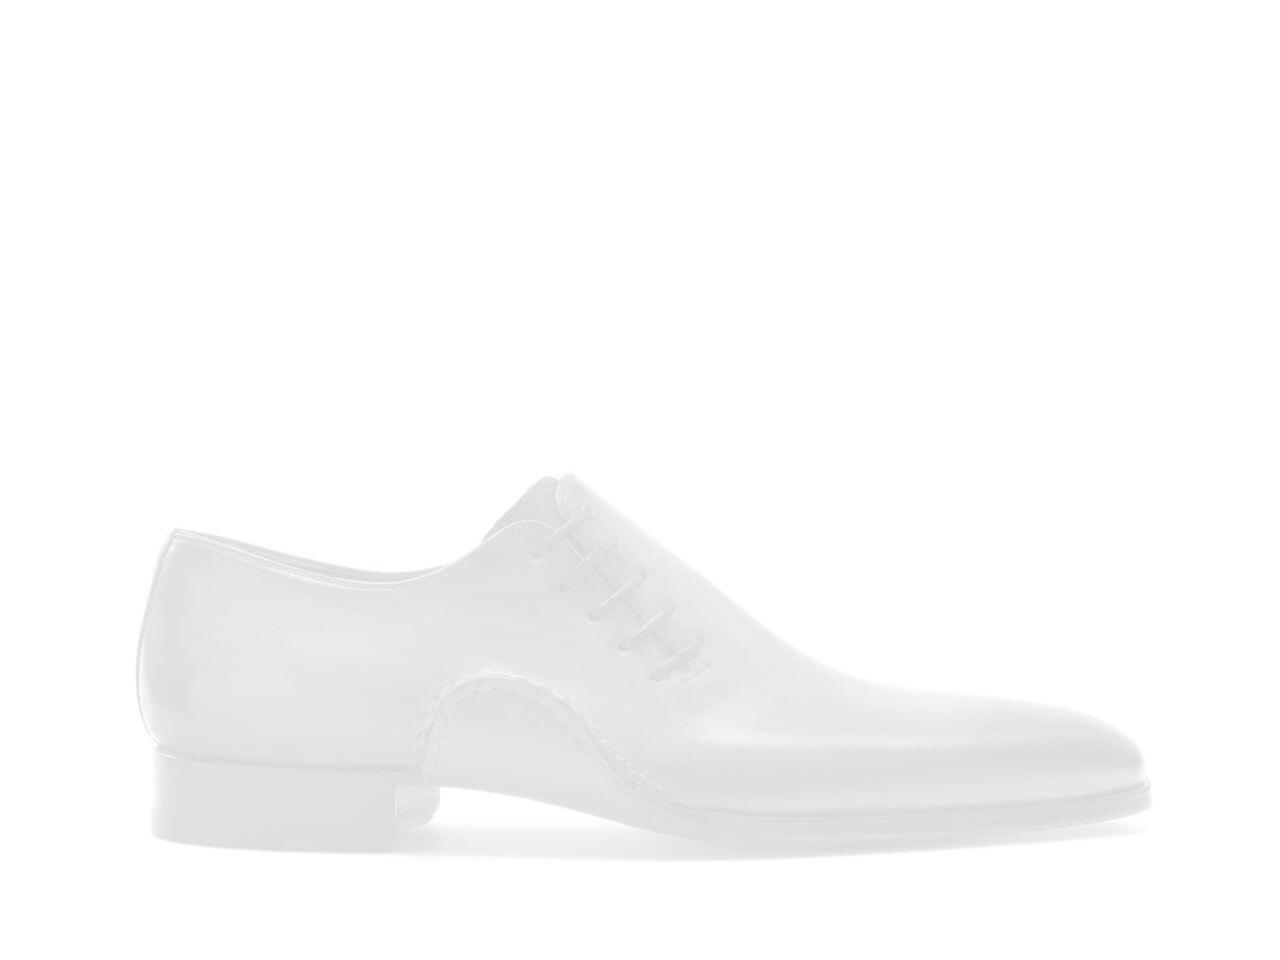 Pair of the Magnanni Hamilton Cuero Men's Oxford Shoes